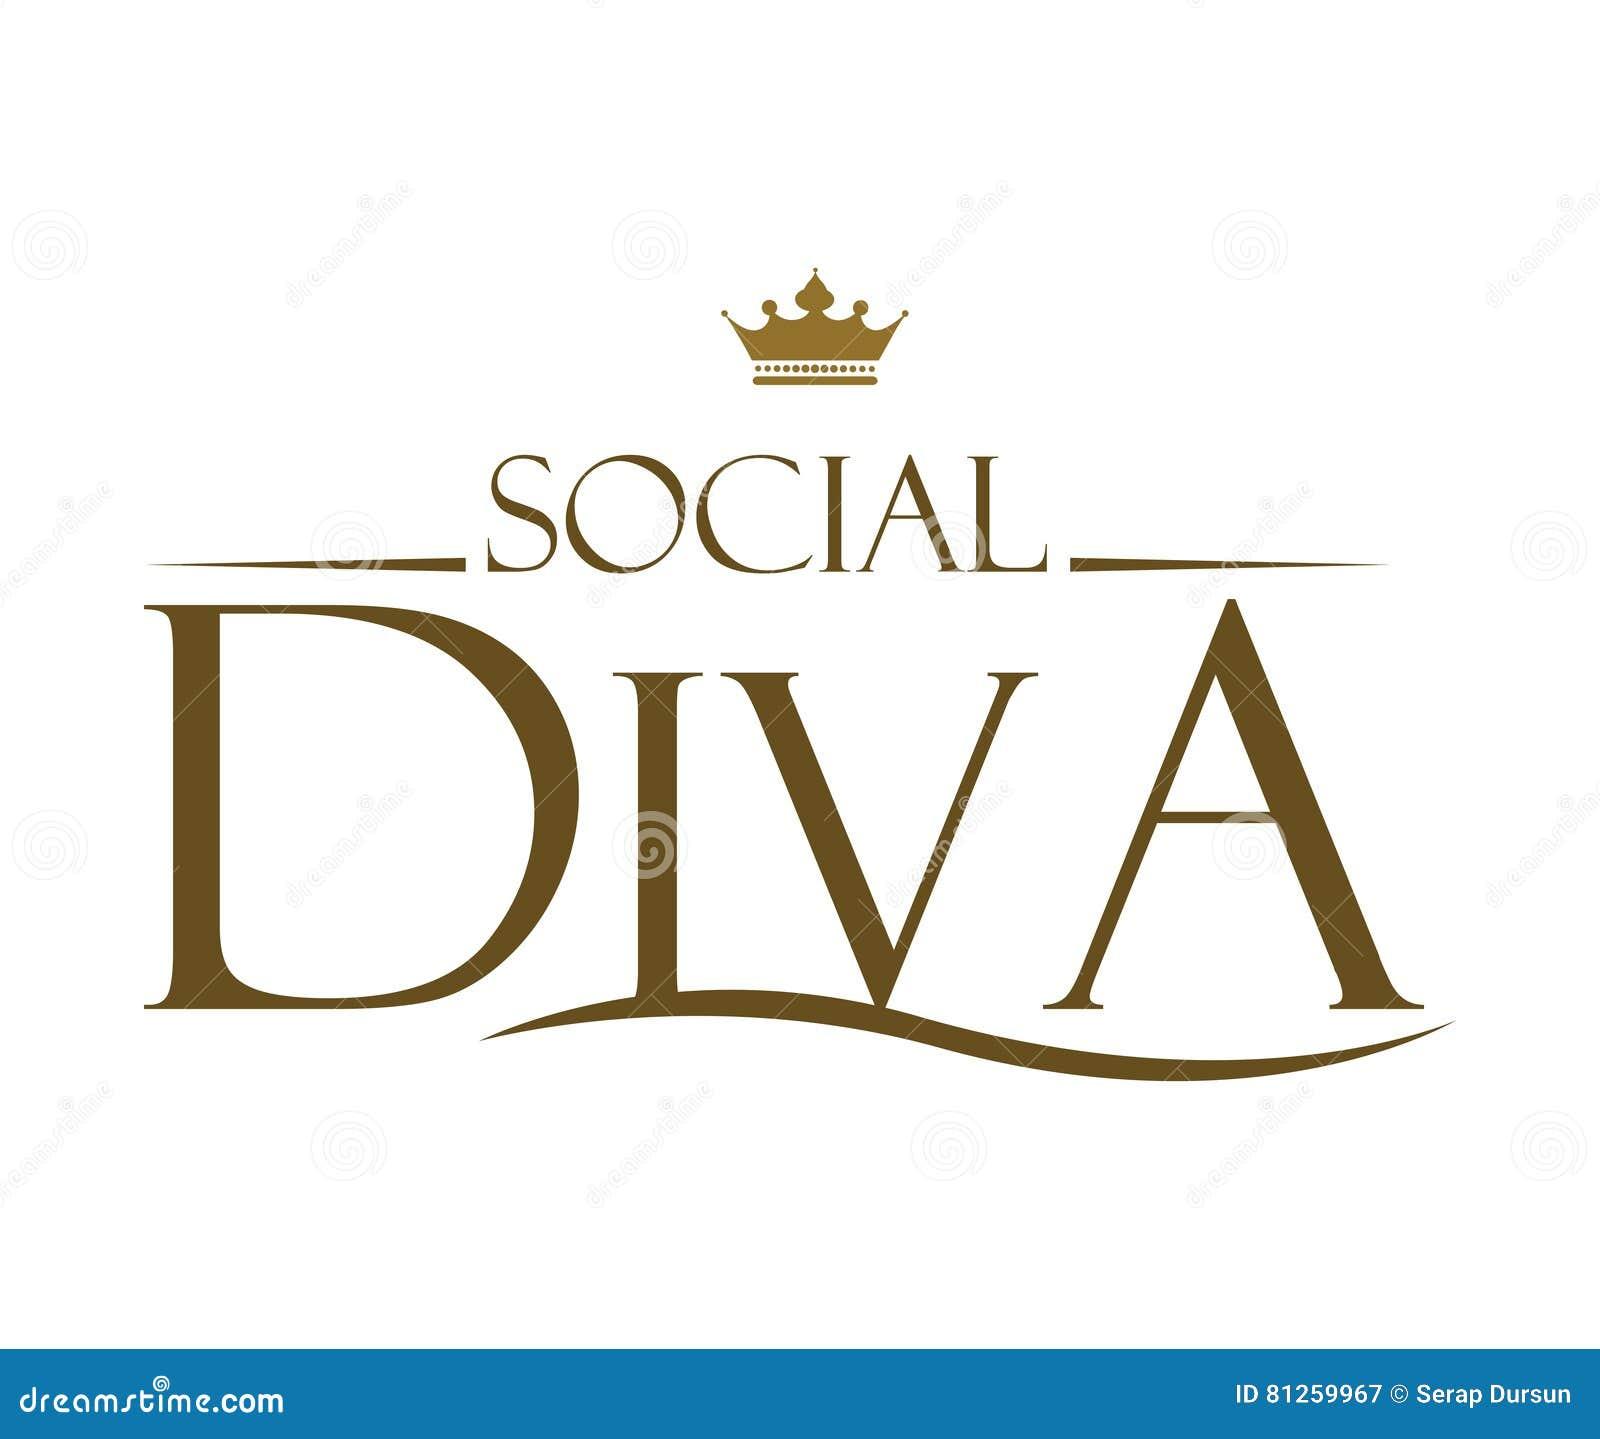 Diva Design: Diva Cartoons, Illustrations & Vector Stock Images